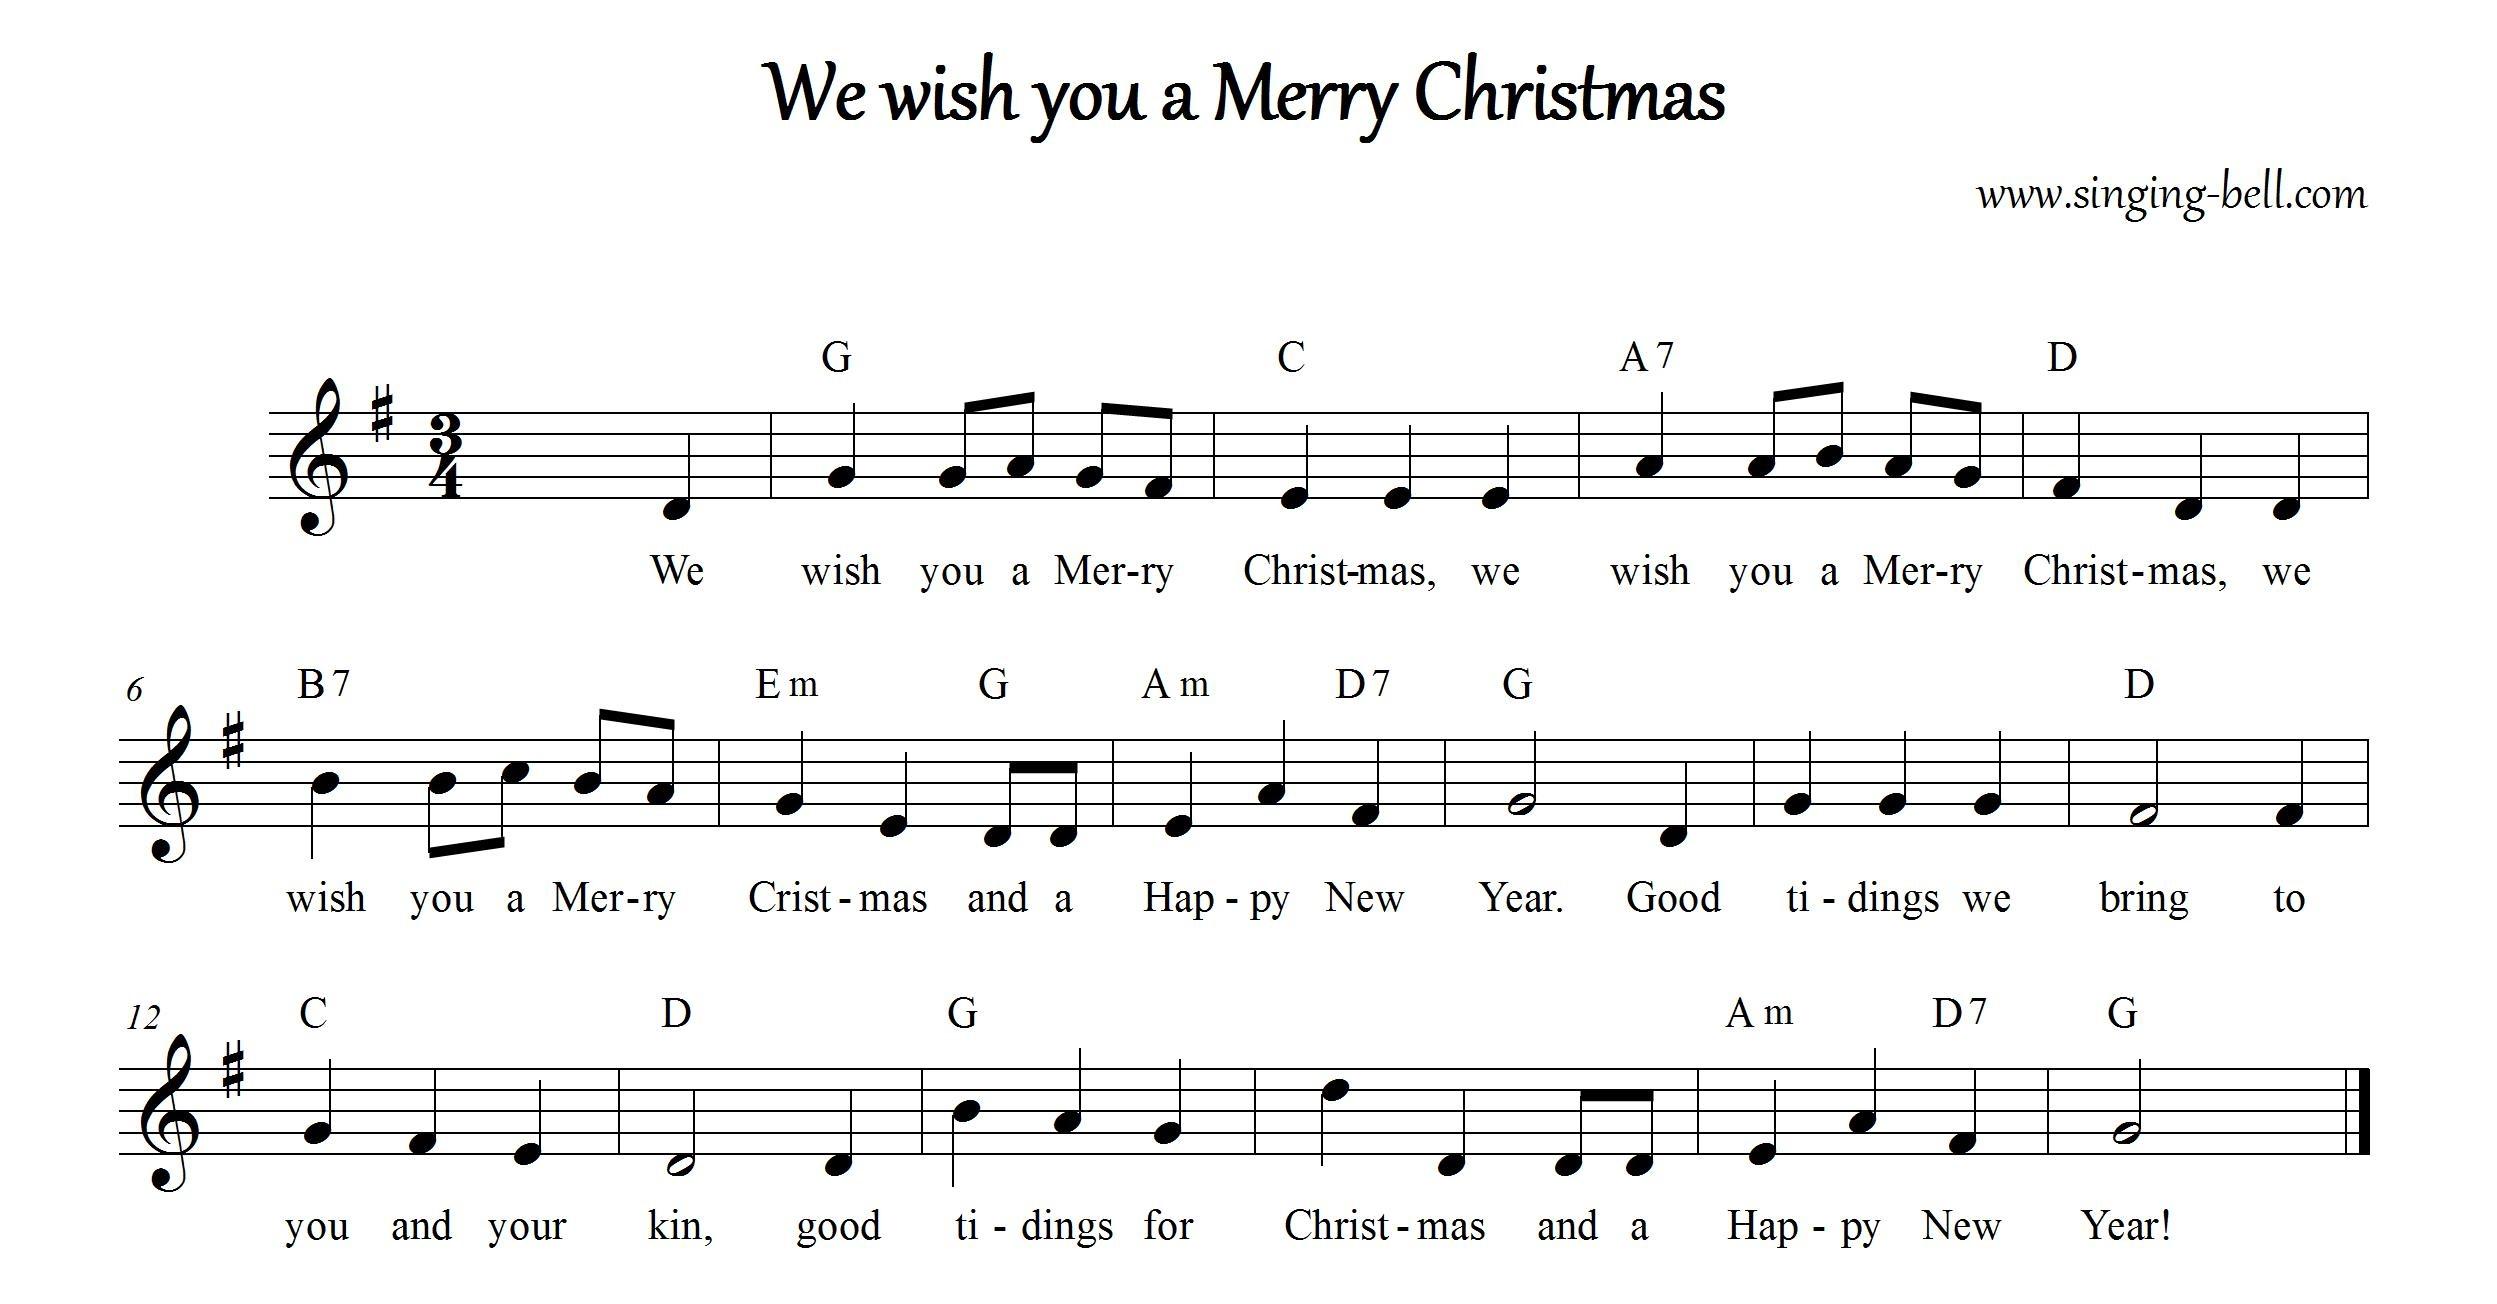 We Wish You A Merry Christmas | Karaoke Carols For Kids - Free Printable Lyrics To Christmas Carols